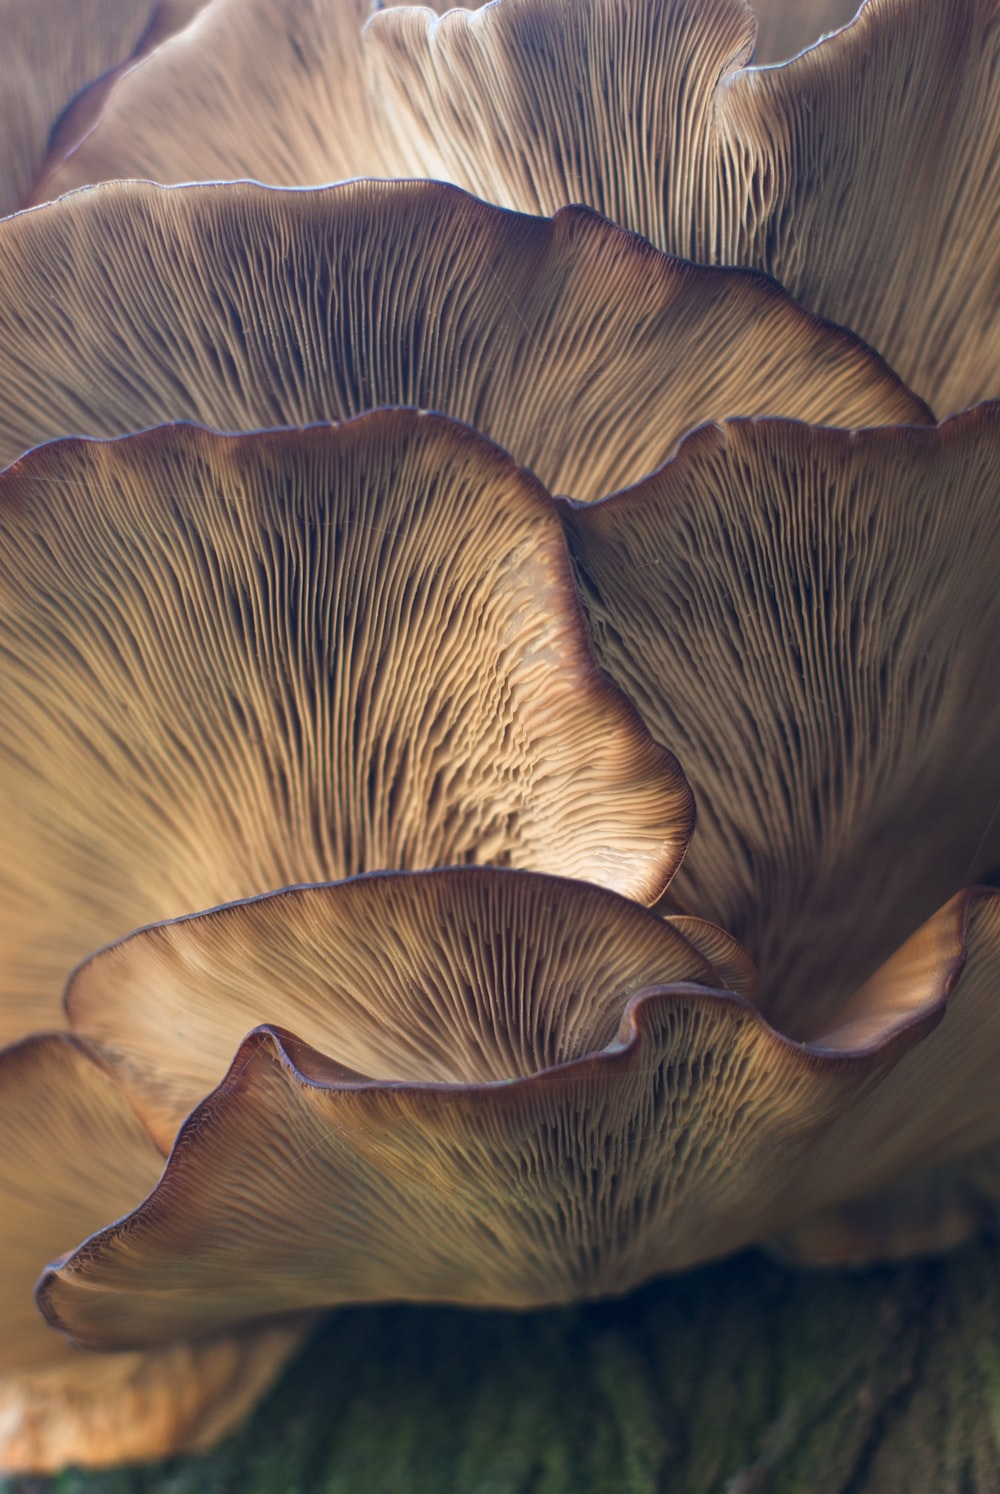 selective focus photo of mushroom